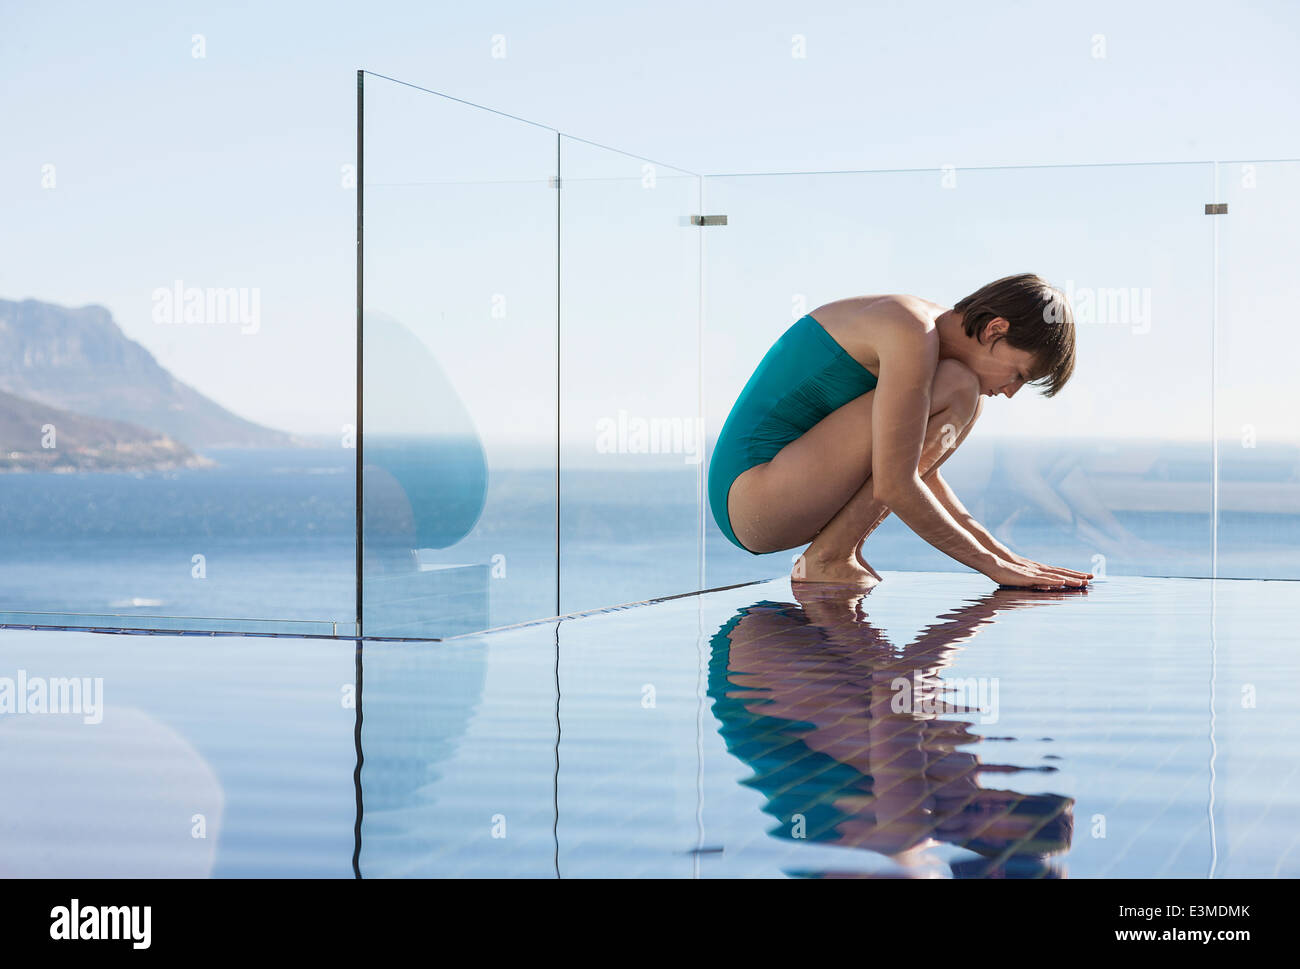 Frau kauert über Infinity-Pool mit Blick aufs Meer Stockbild